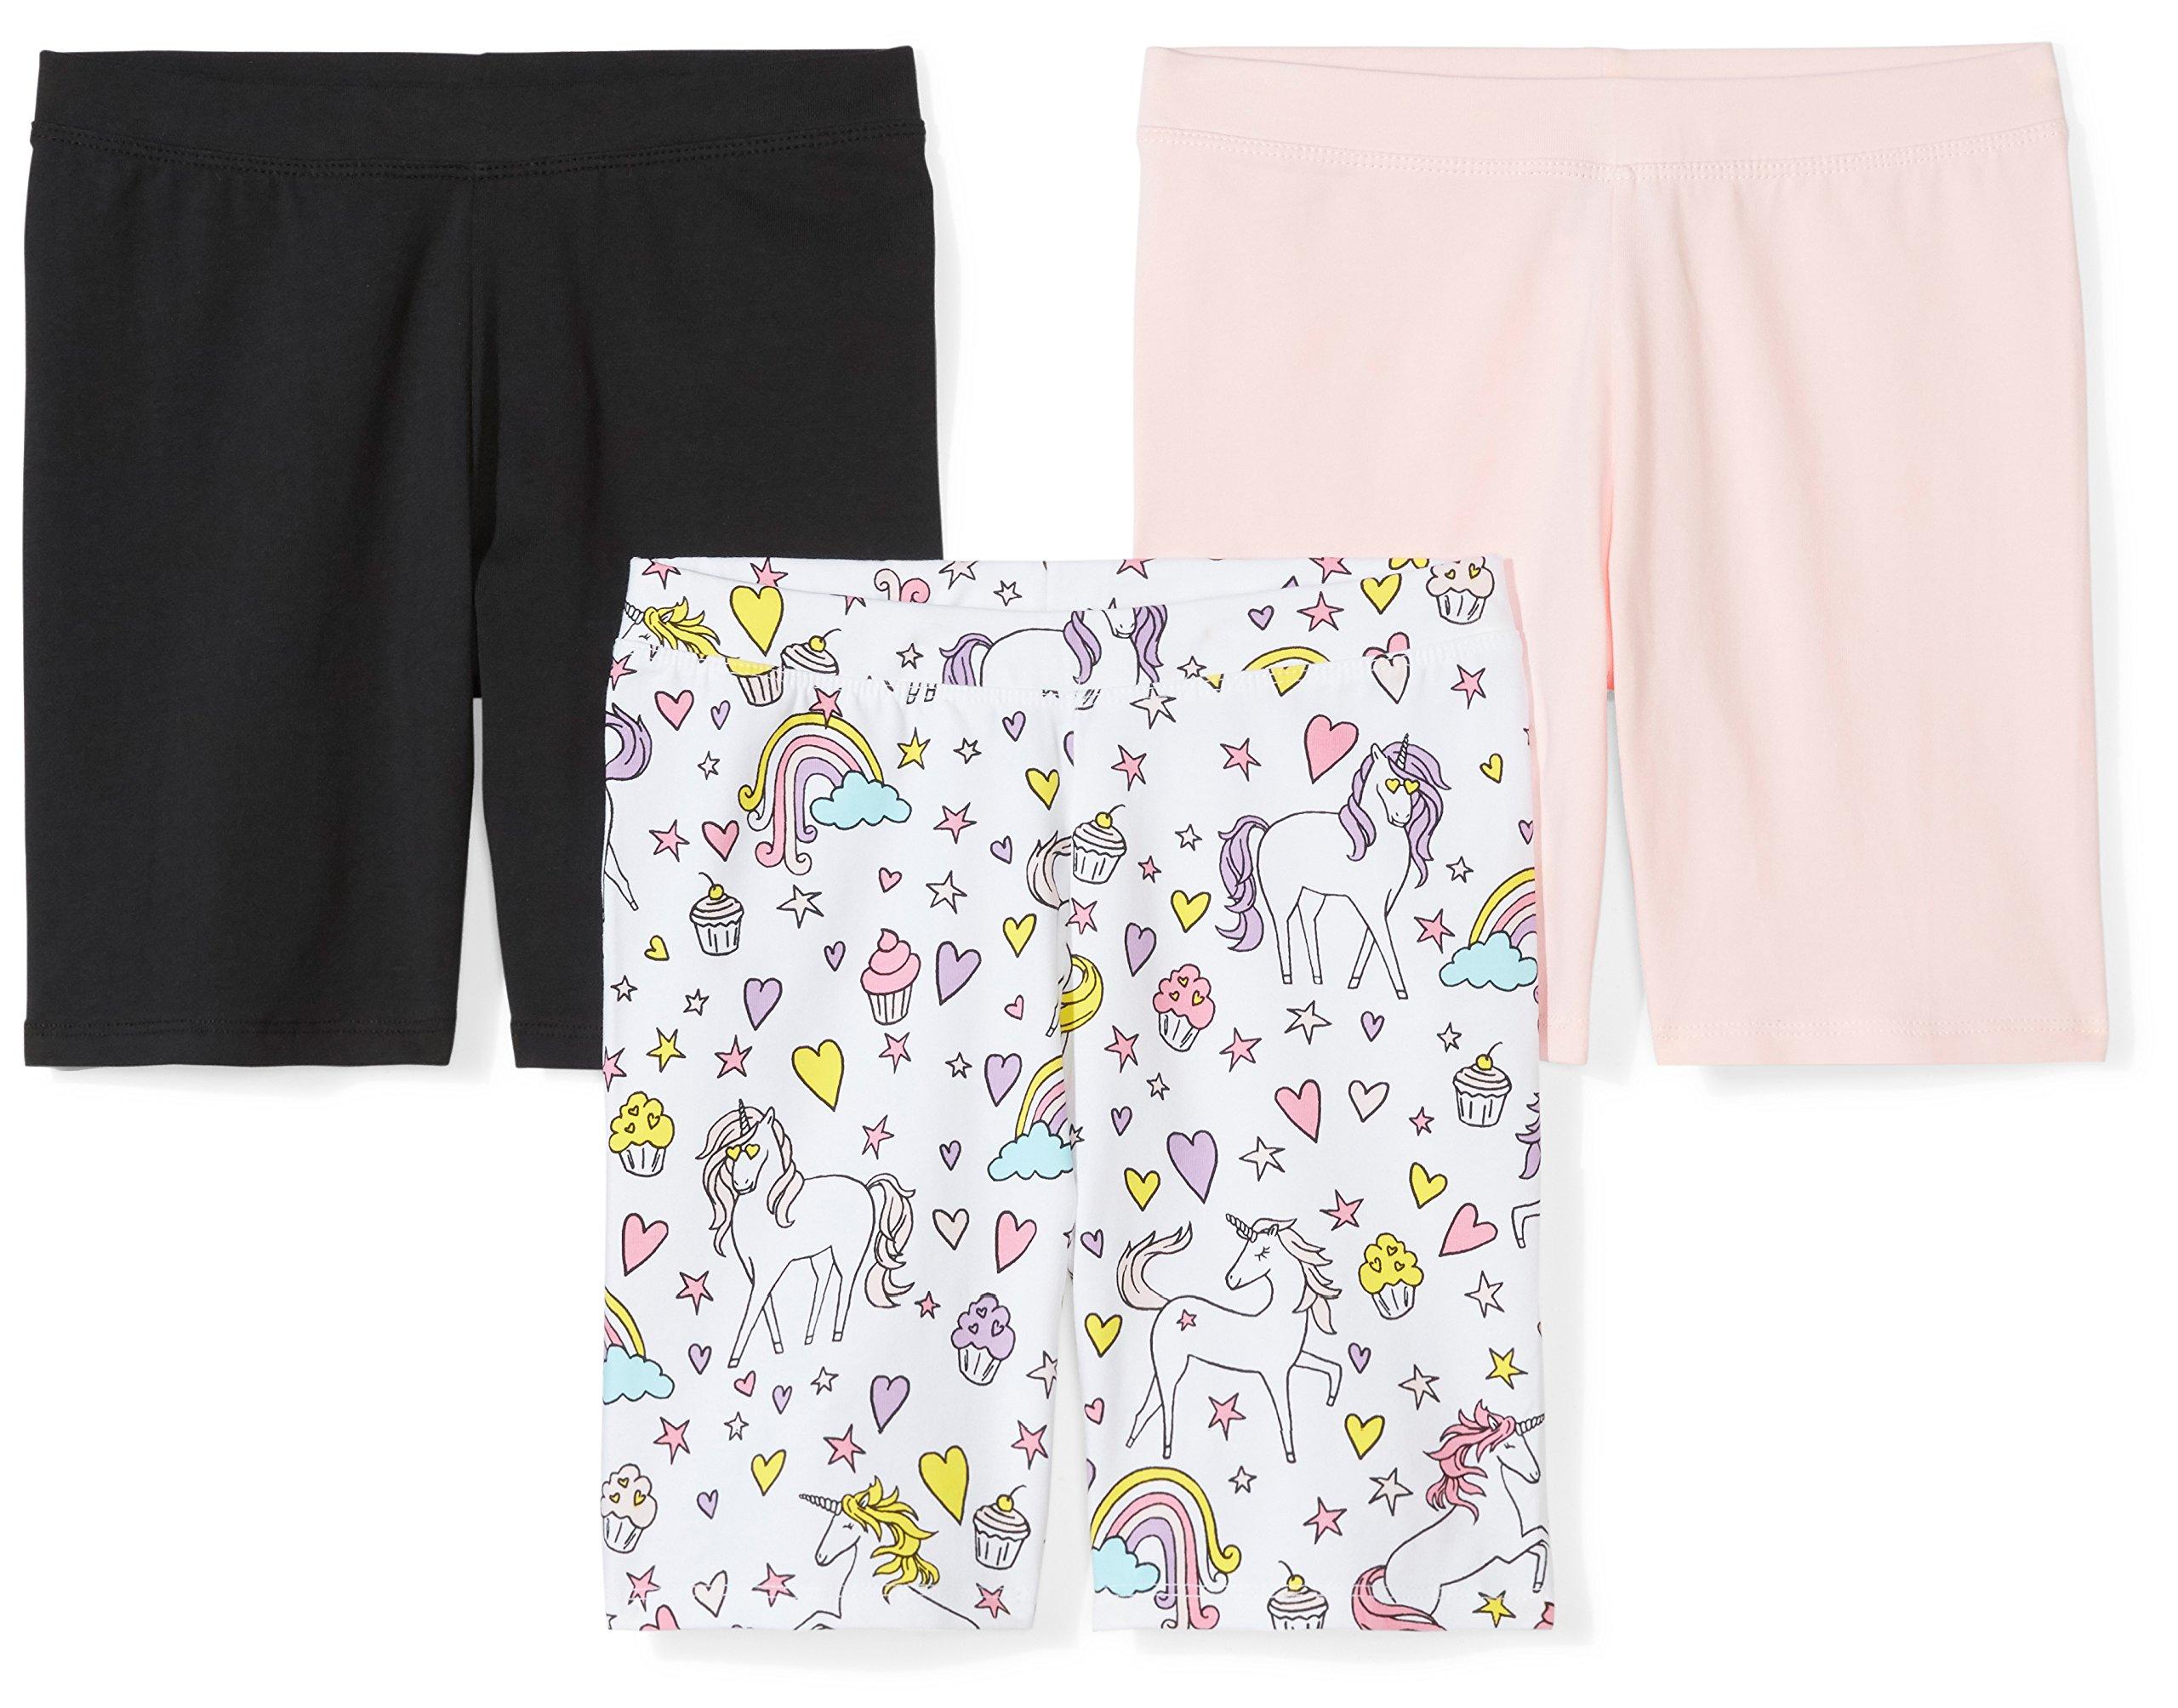 Spotted Zebra Girls' Toddler 3-Pack Bike Shorts, Black/Pink/Unicorn, 4T